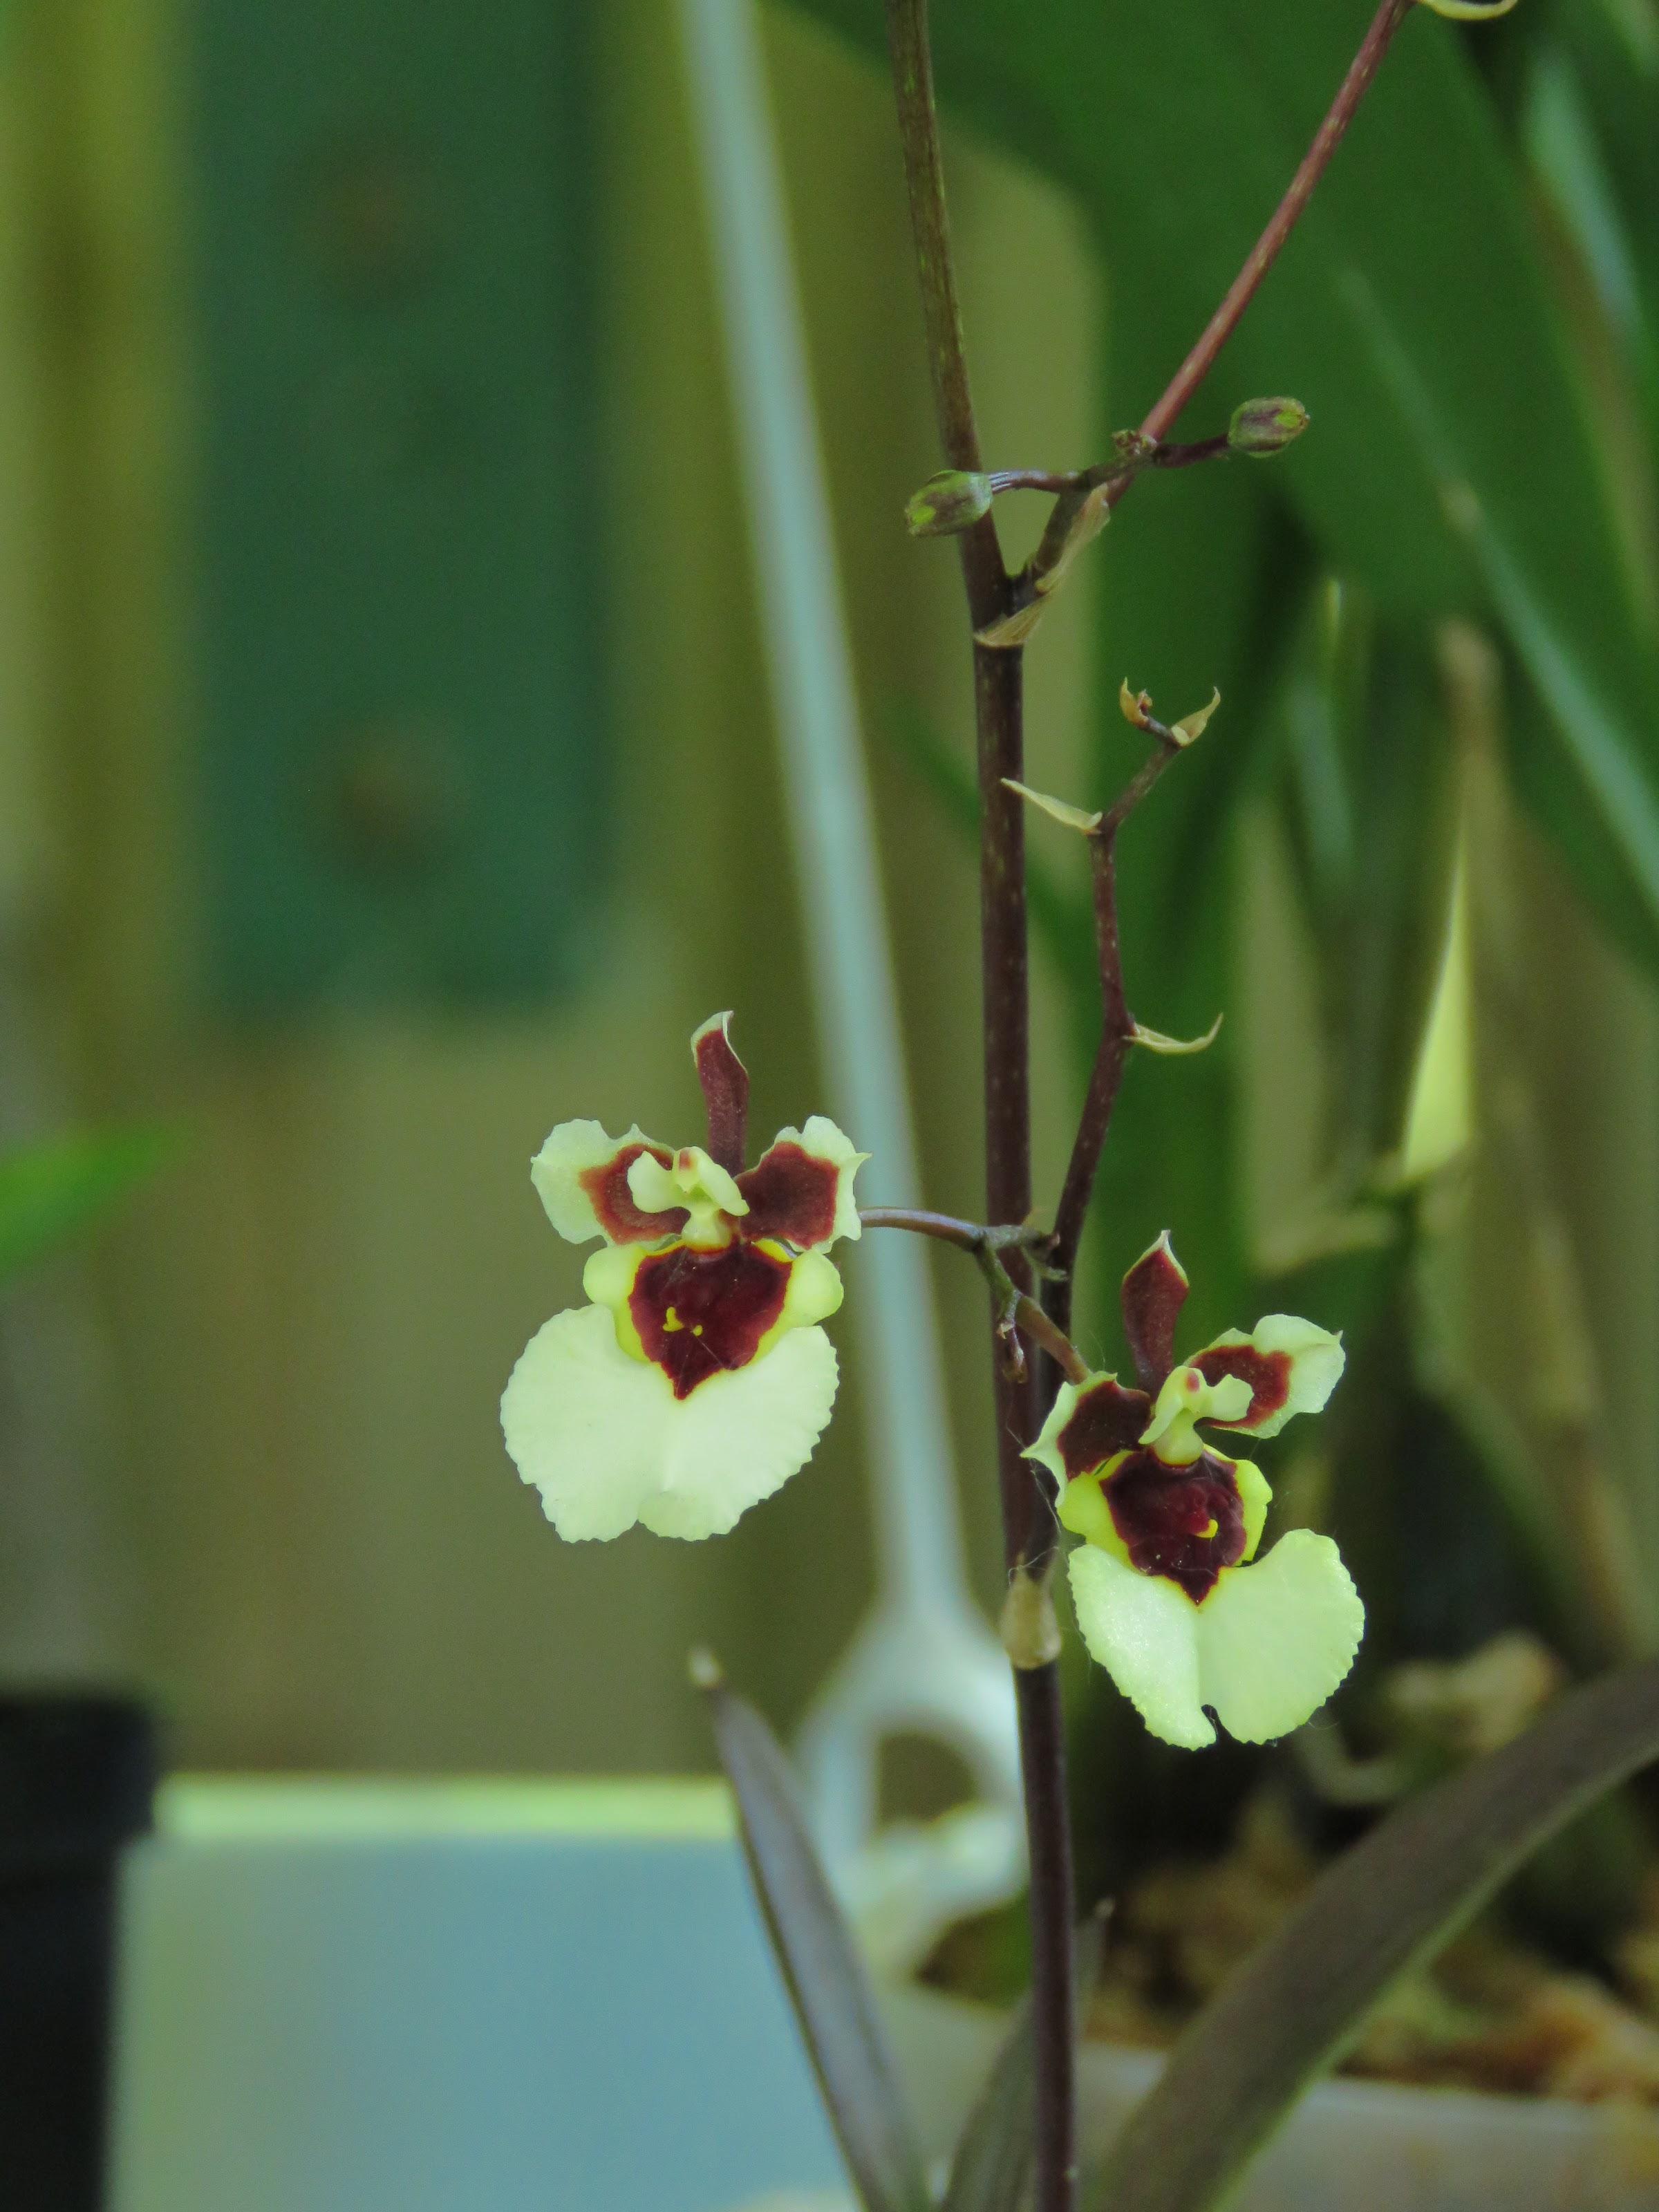 Les orchidées de Grigri - Page 5 U3y7b_Xi_ynneiGlg9sGzAOXQ5lc_VBfOm7-x0MGAt1dz8g9NTGpKliTl2ZwL1DWQqHoheDuO-g4RCPzH6n-lduYzmAjwb3VYTTpYRXcziobObzRQePwQZjUgpt9DpslvpZ5j1DA1vk=w2400